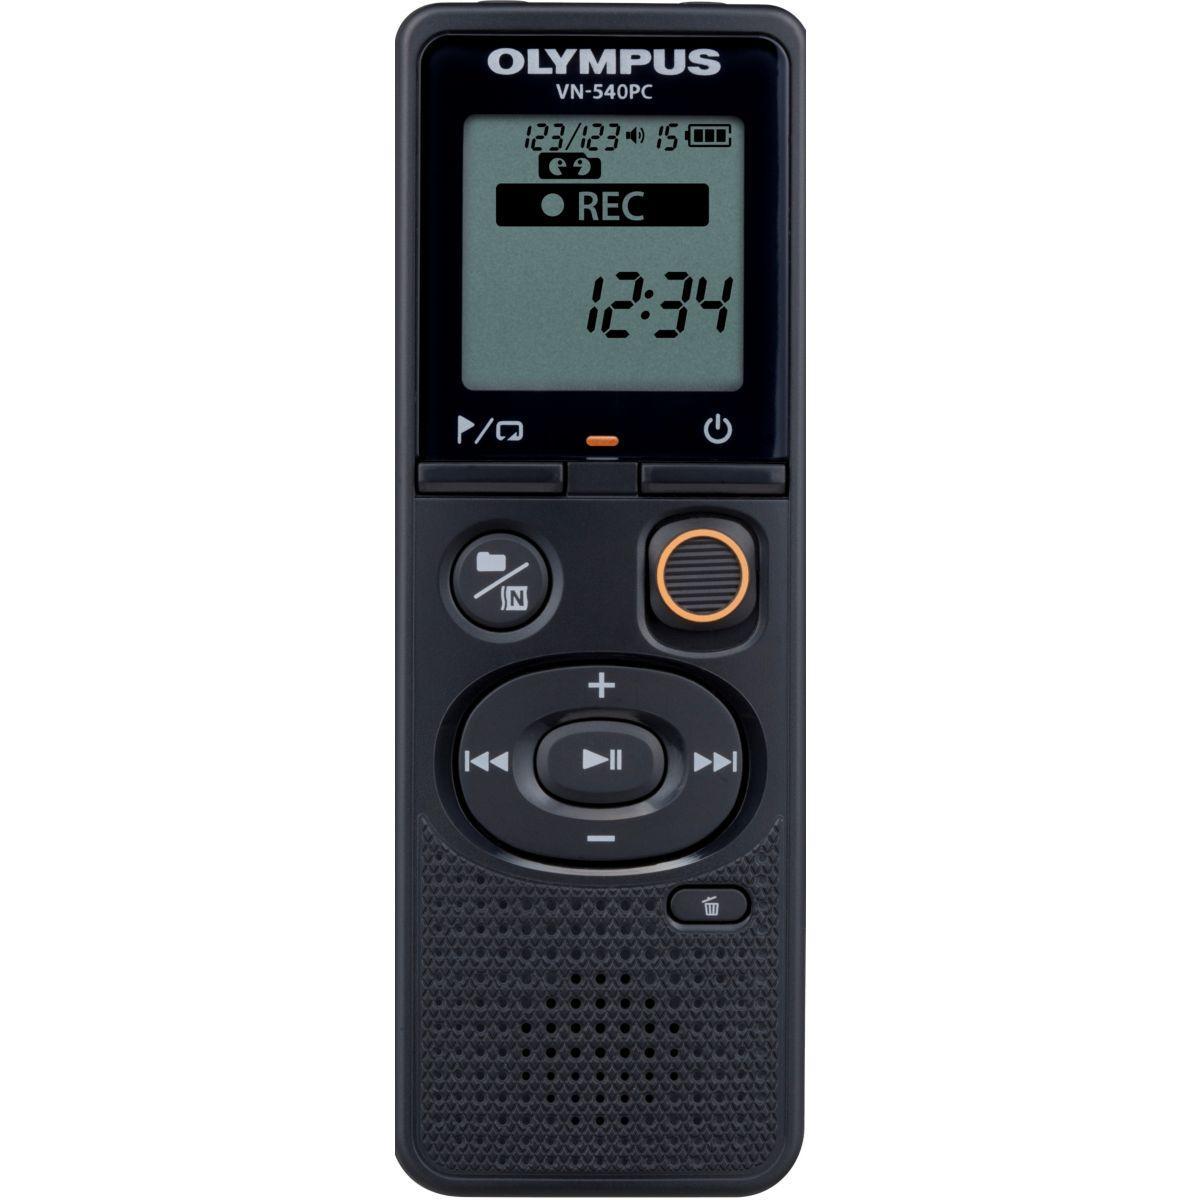 Dictaphone olympus vn-540 - 20% de remise immédiate avec le code : cool20 (photo)